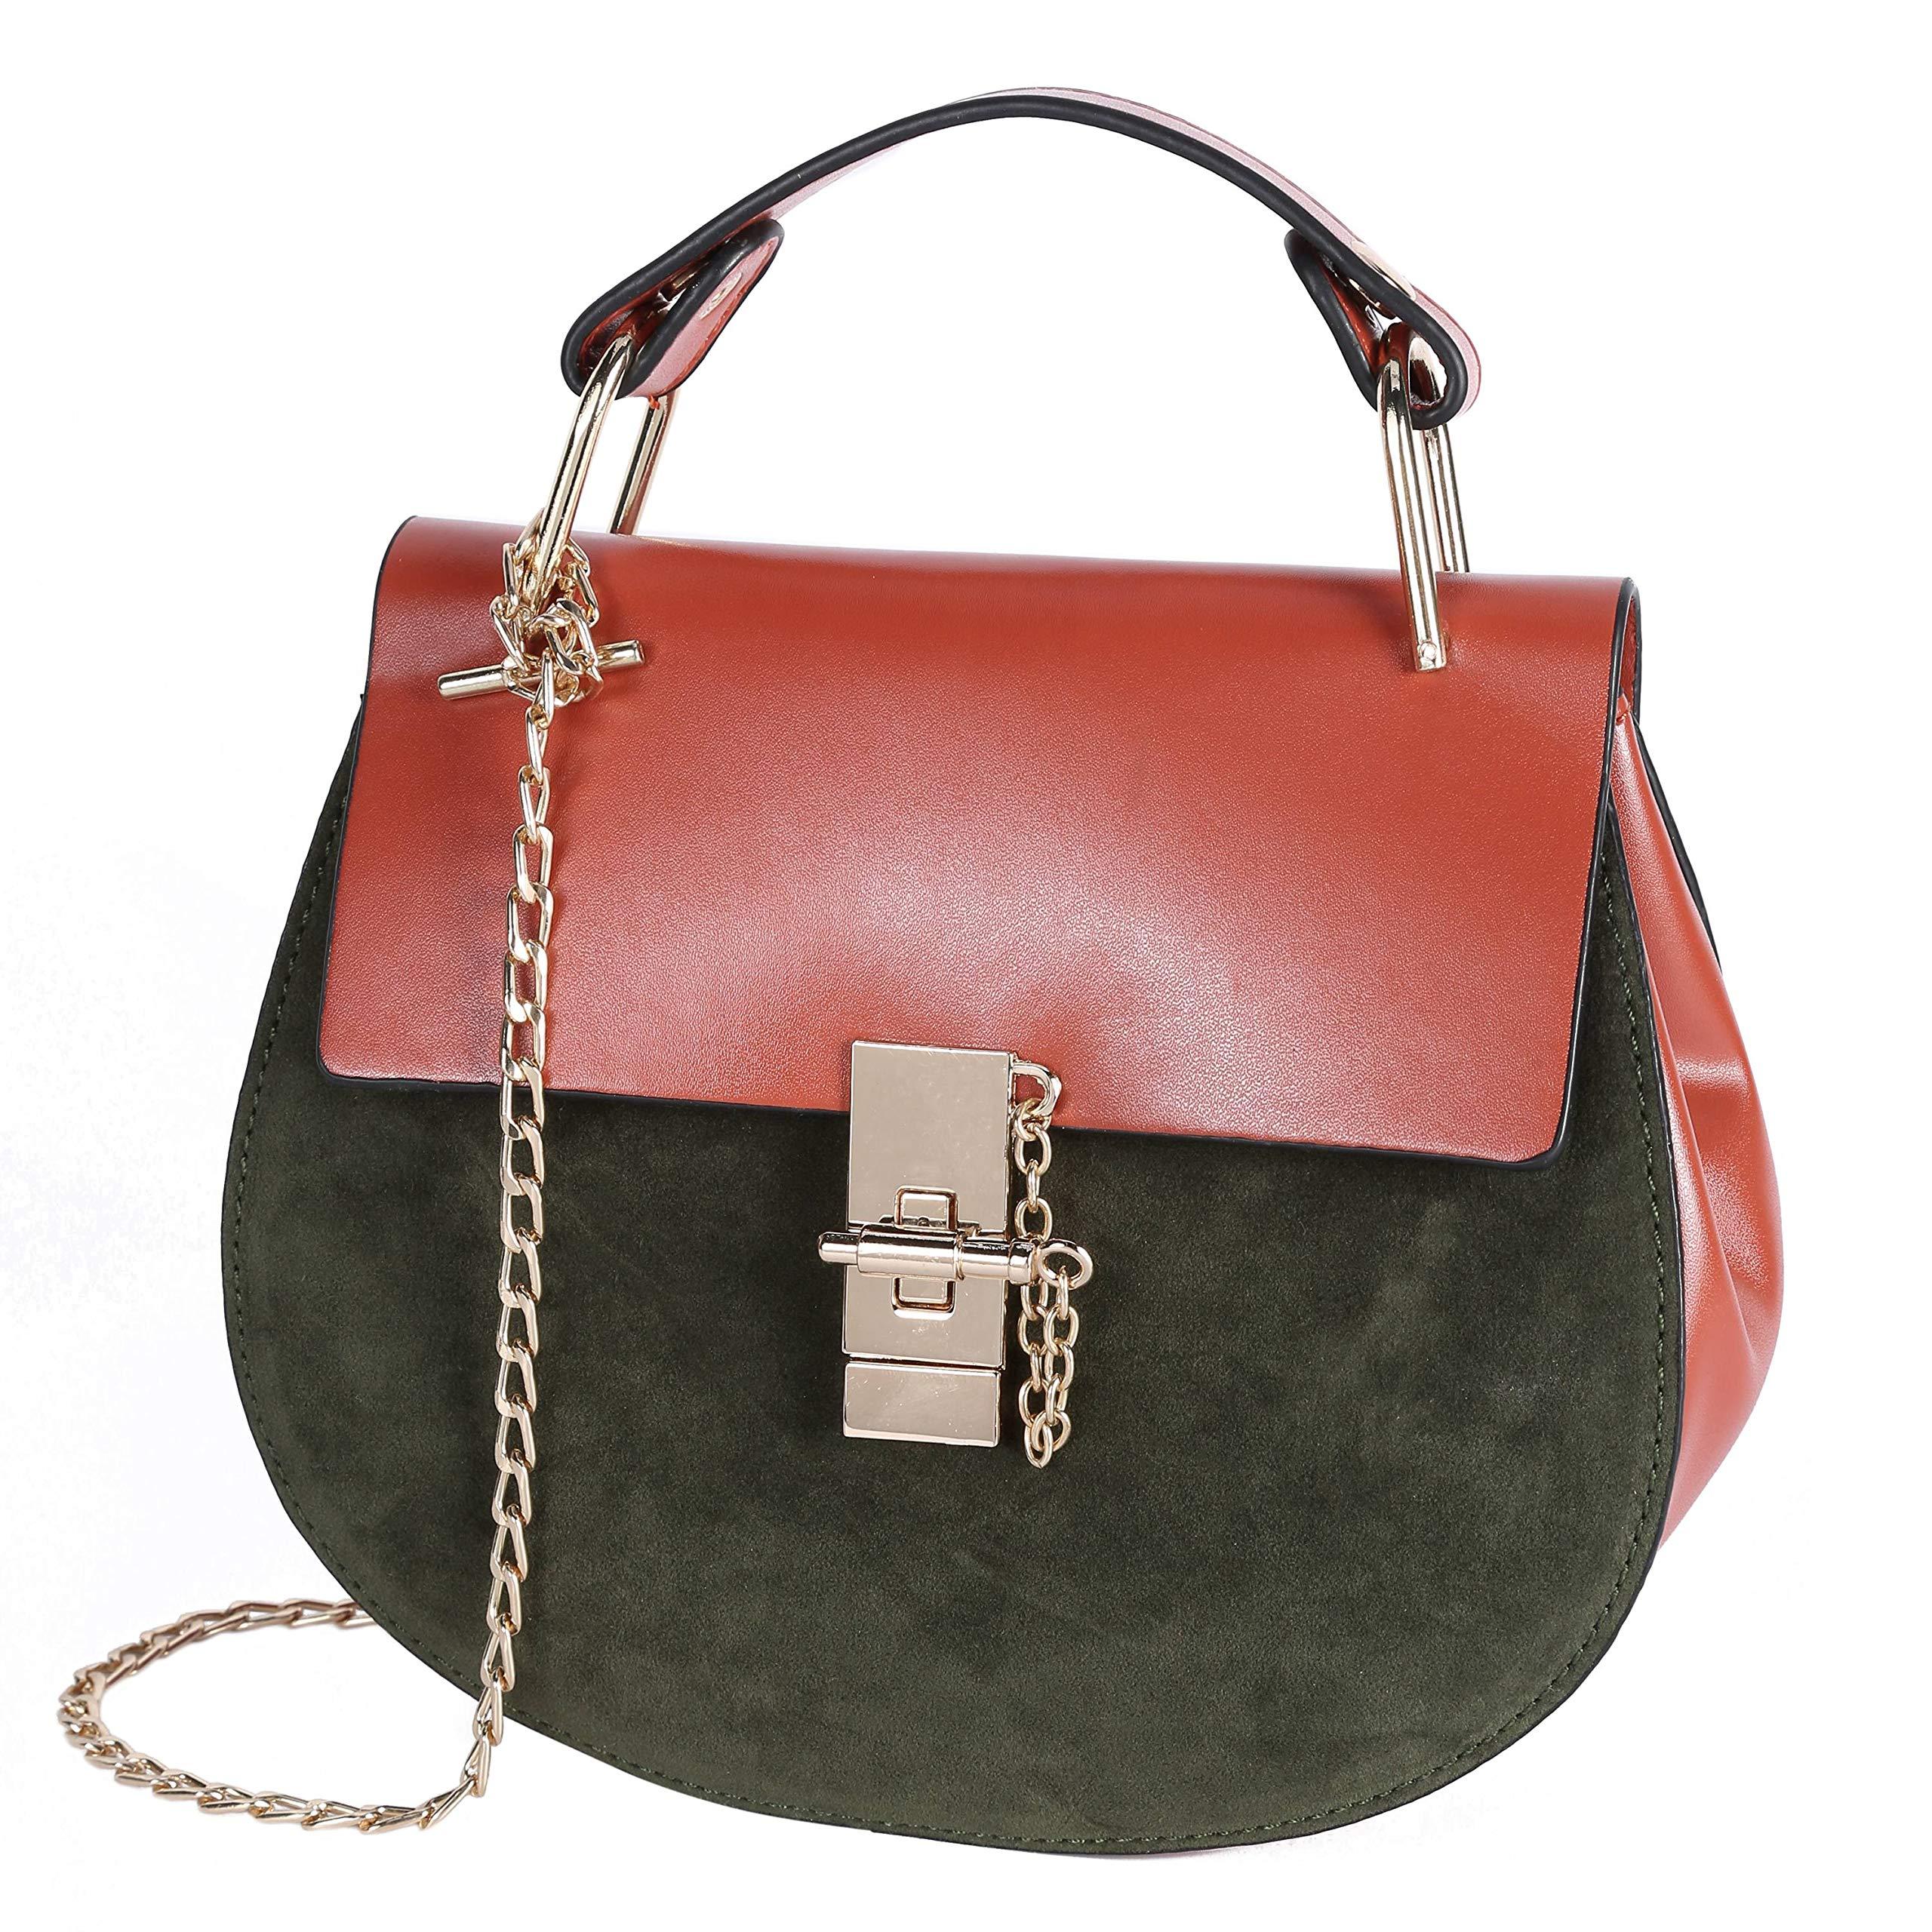 0a5c31e40 Bolso para Mujer Bolso de hombro de cuero PU Bolso de mano para mujer  señoras product